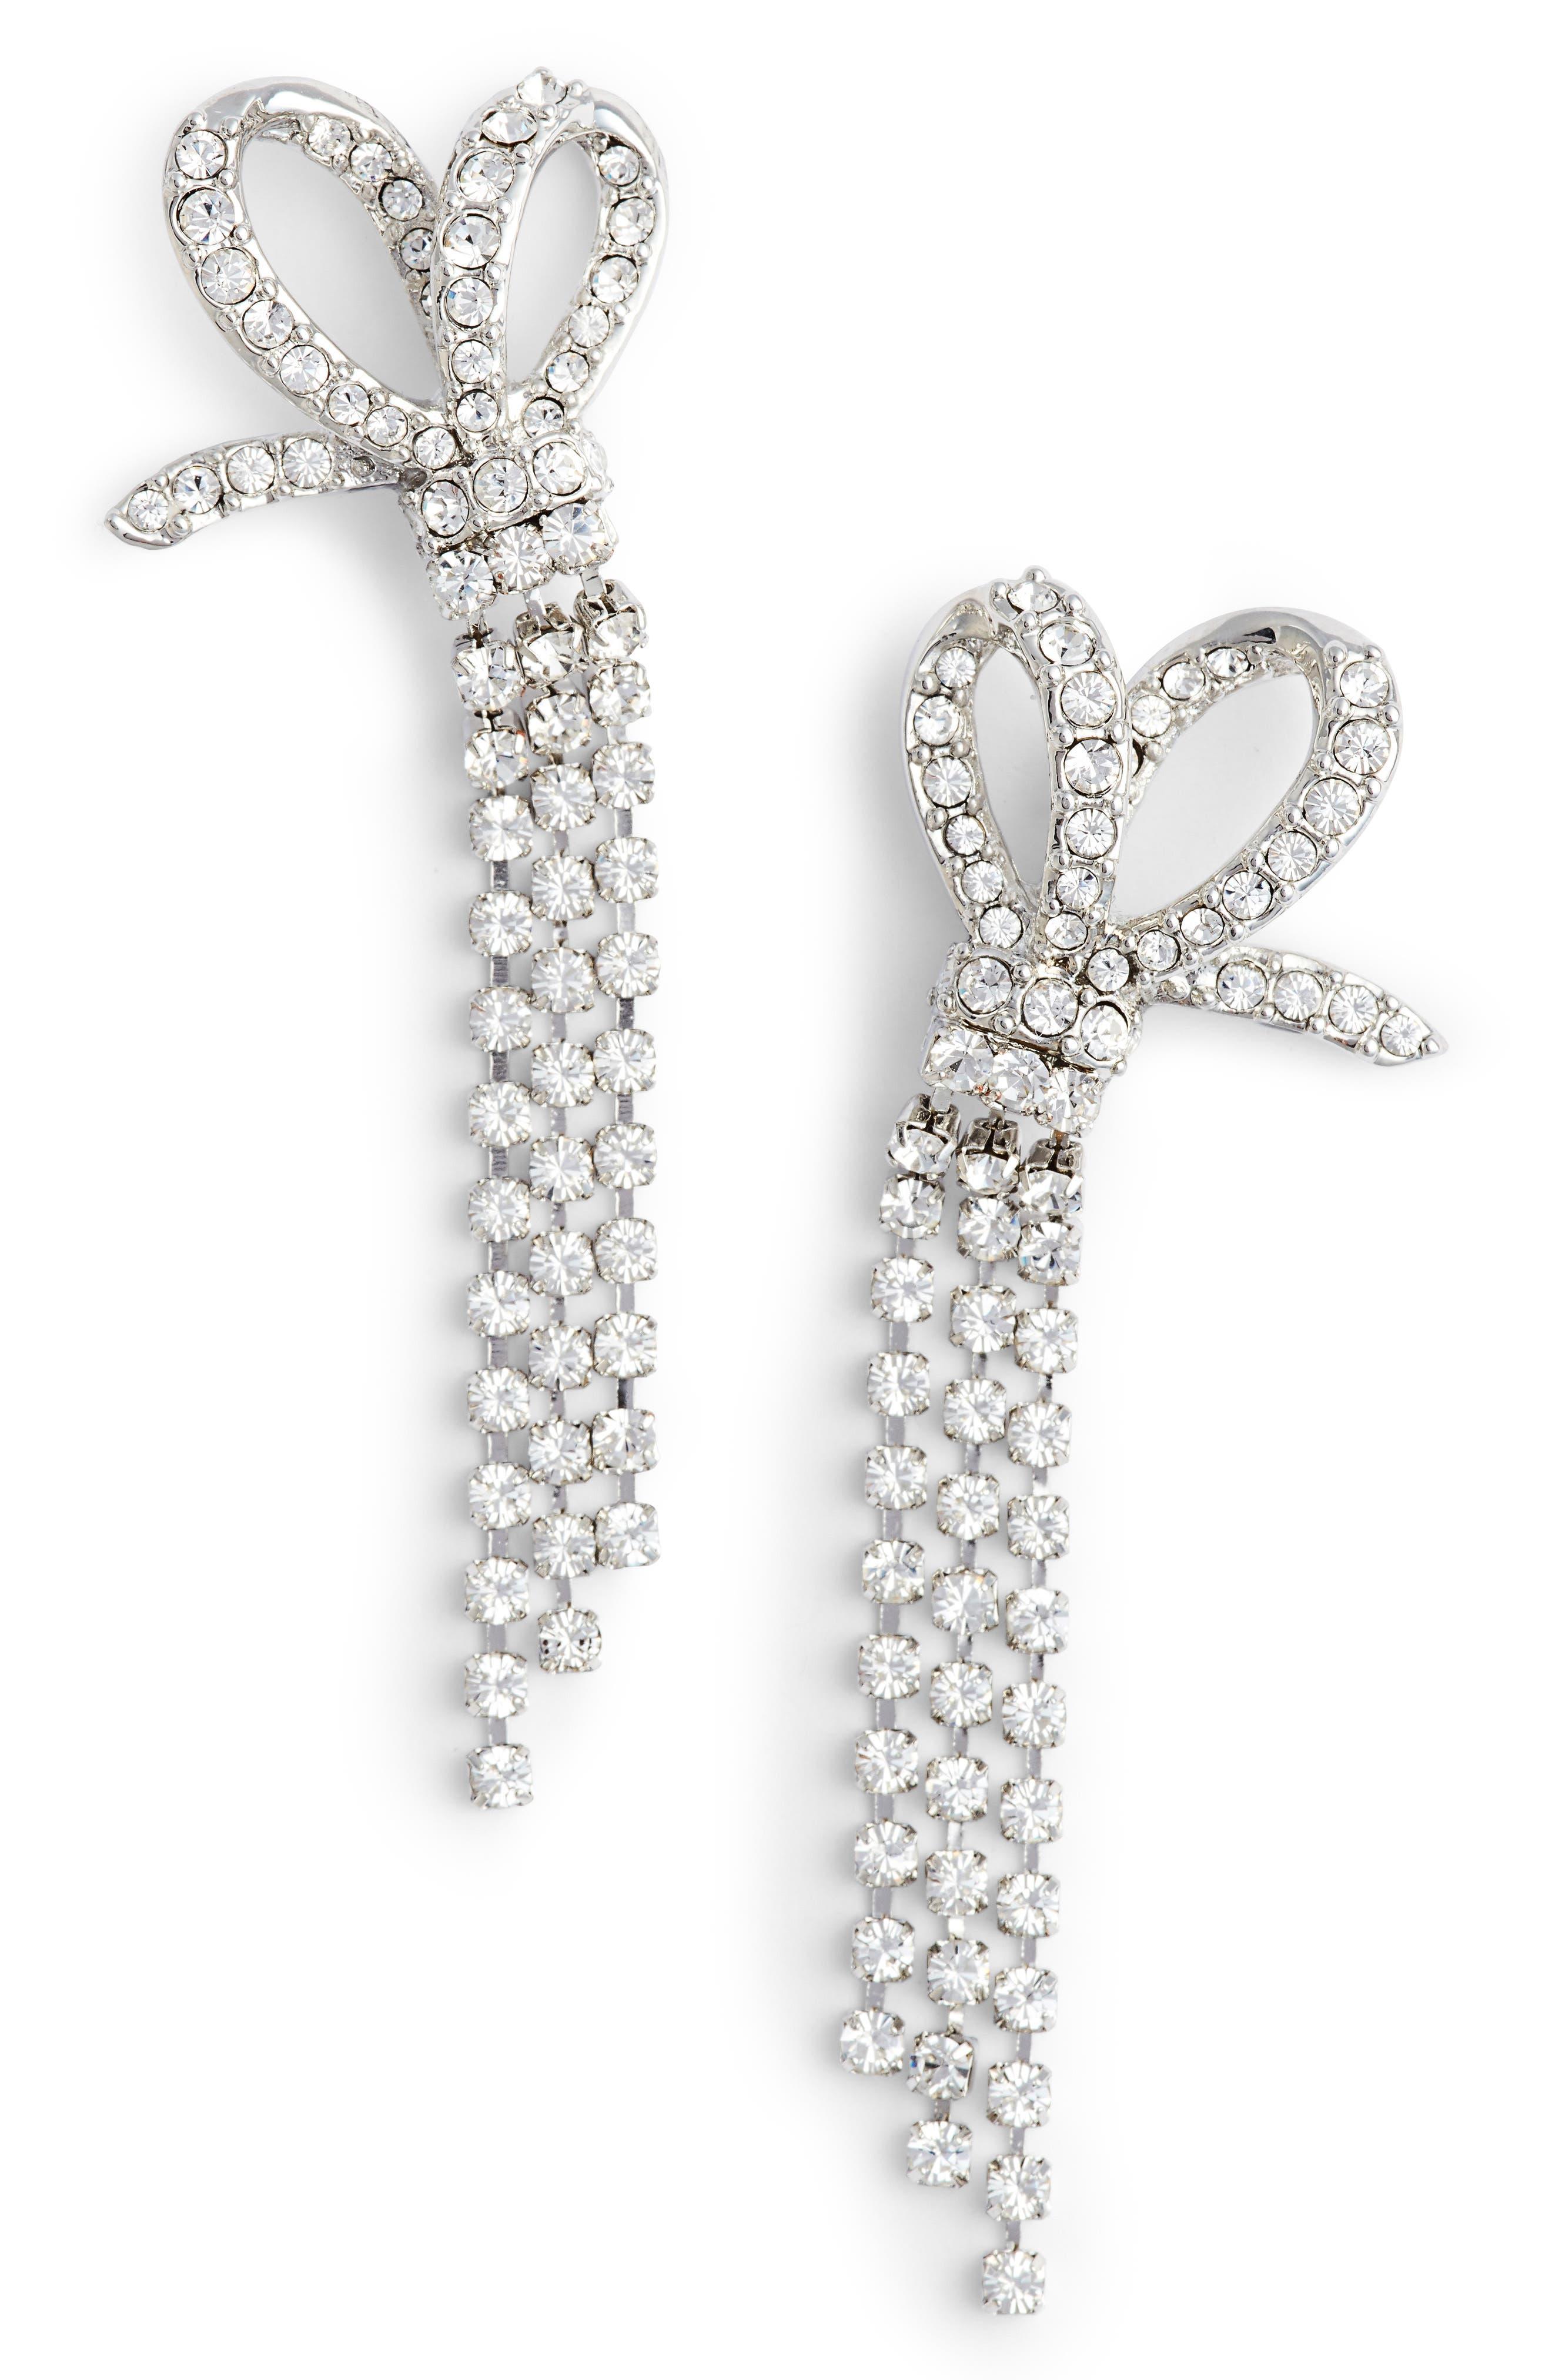 Main Image - Jenny Packham Drop Earrings